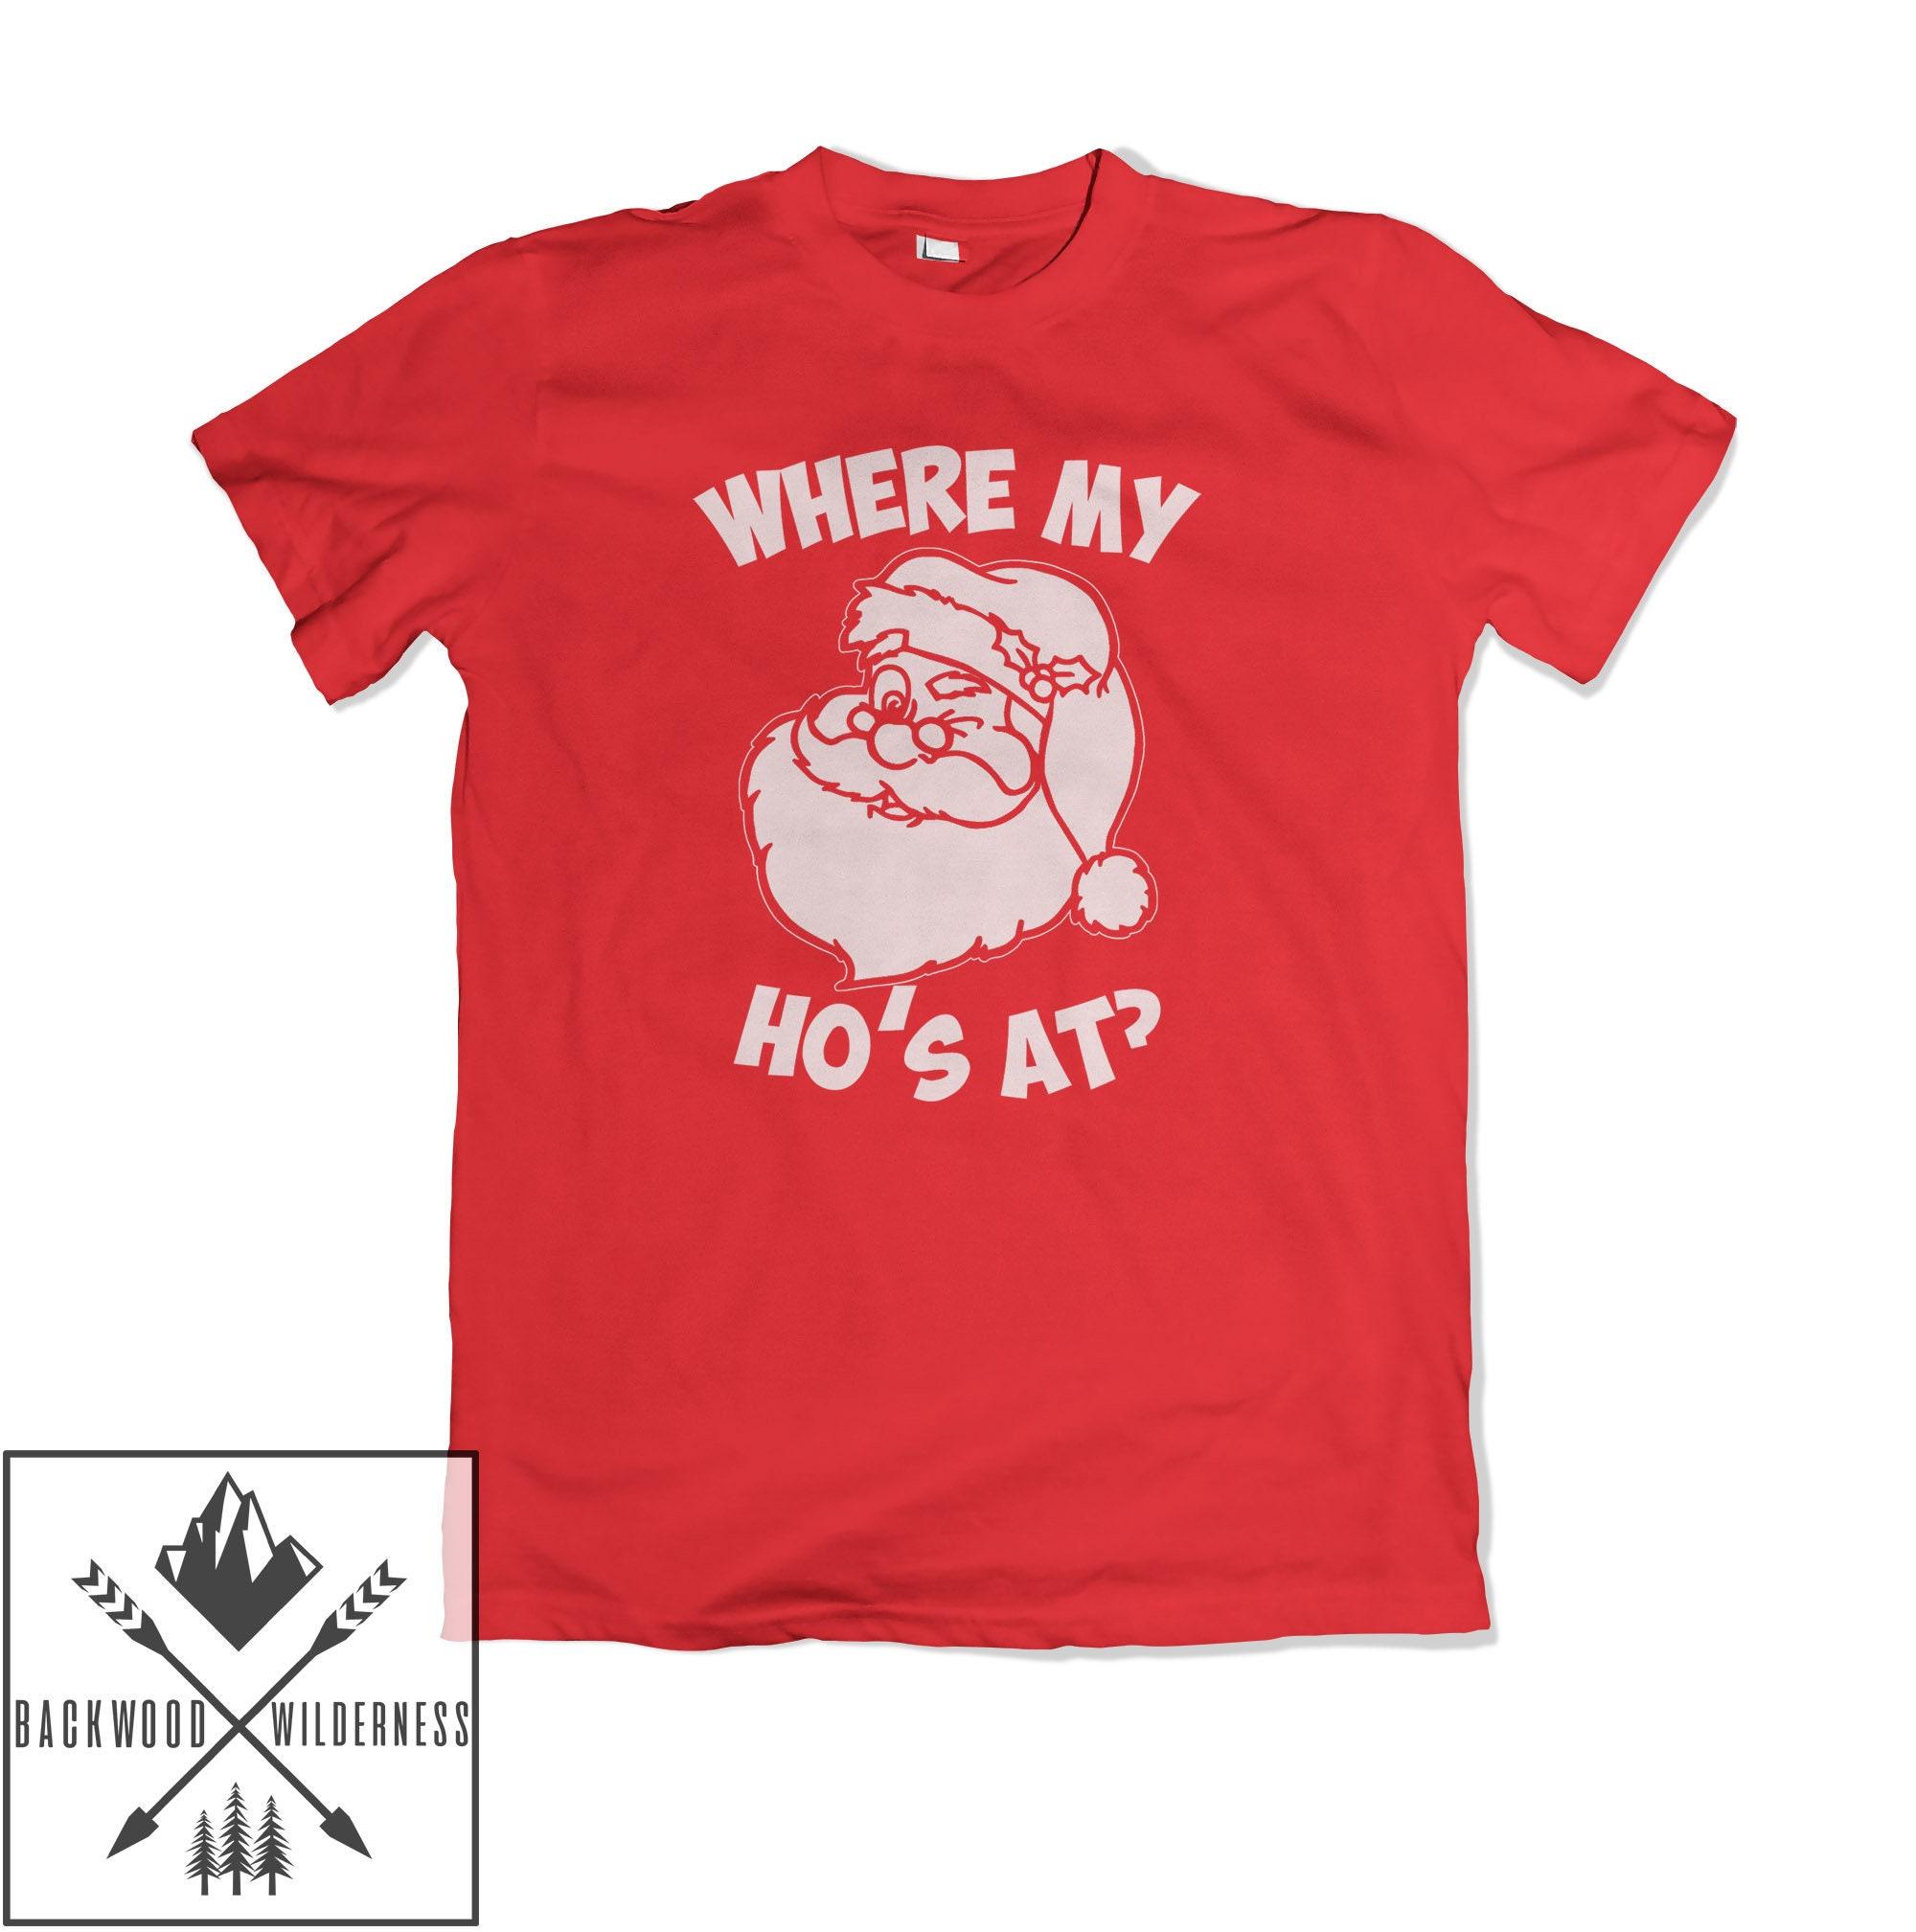 My Face Funny Tee T-Shirt Top Tumblr Novelty Xmas Gift Secret Santa Mens Ladies